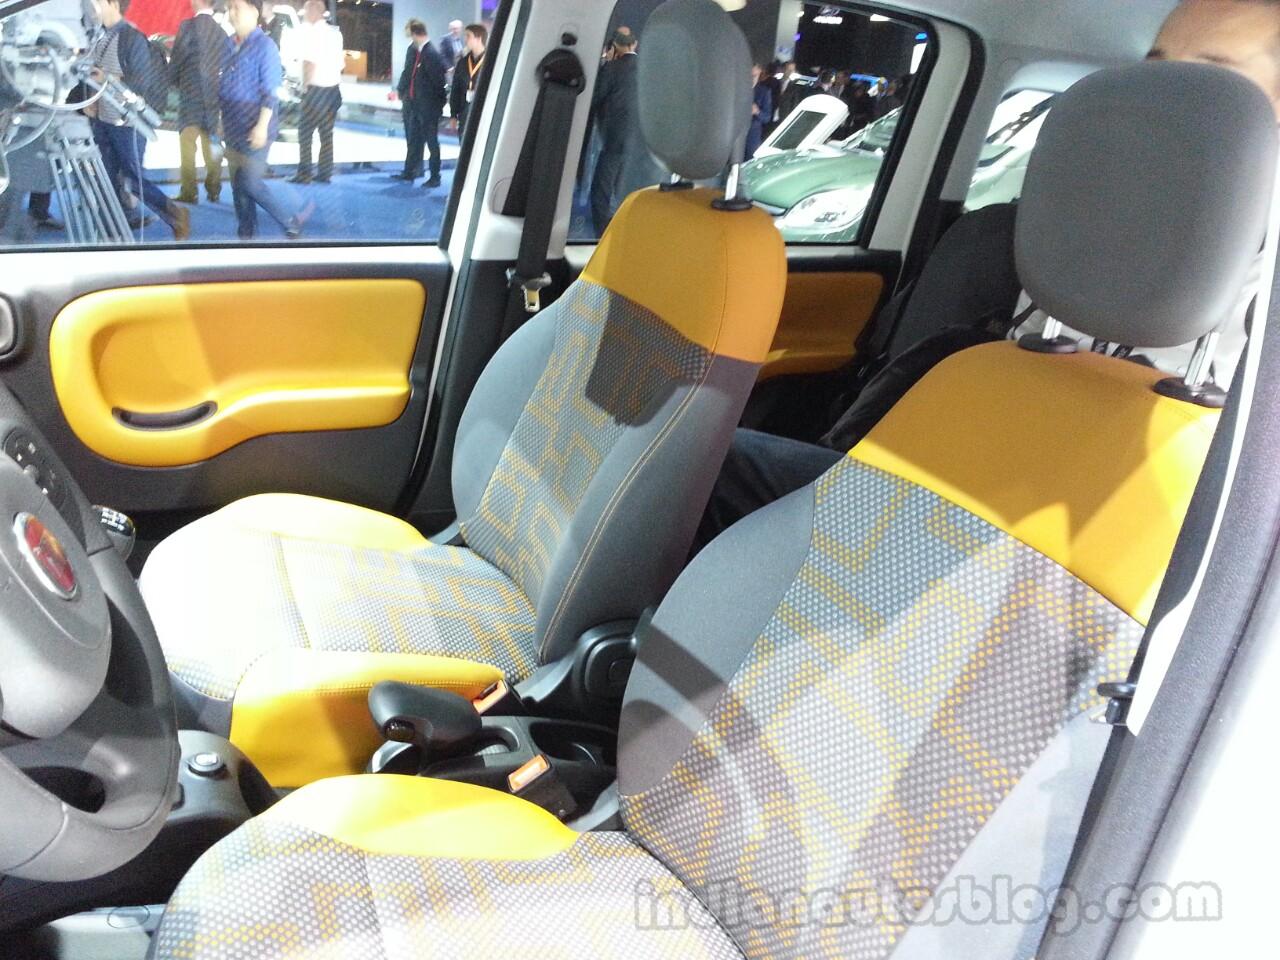 Fiat Panda Antartica seats